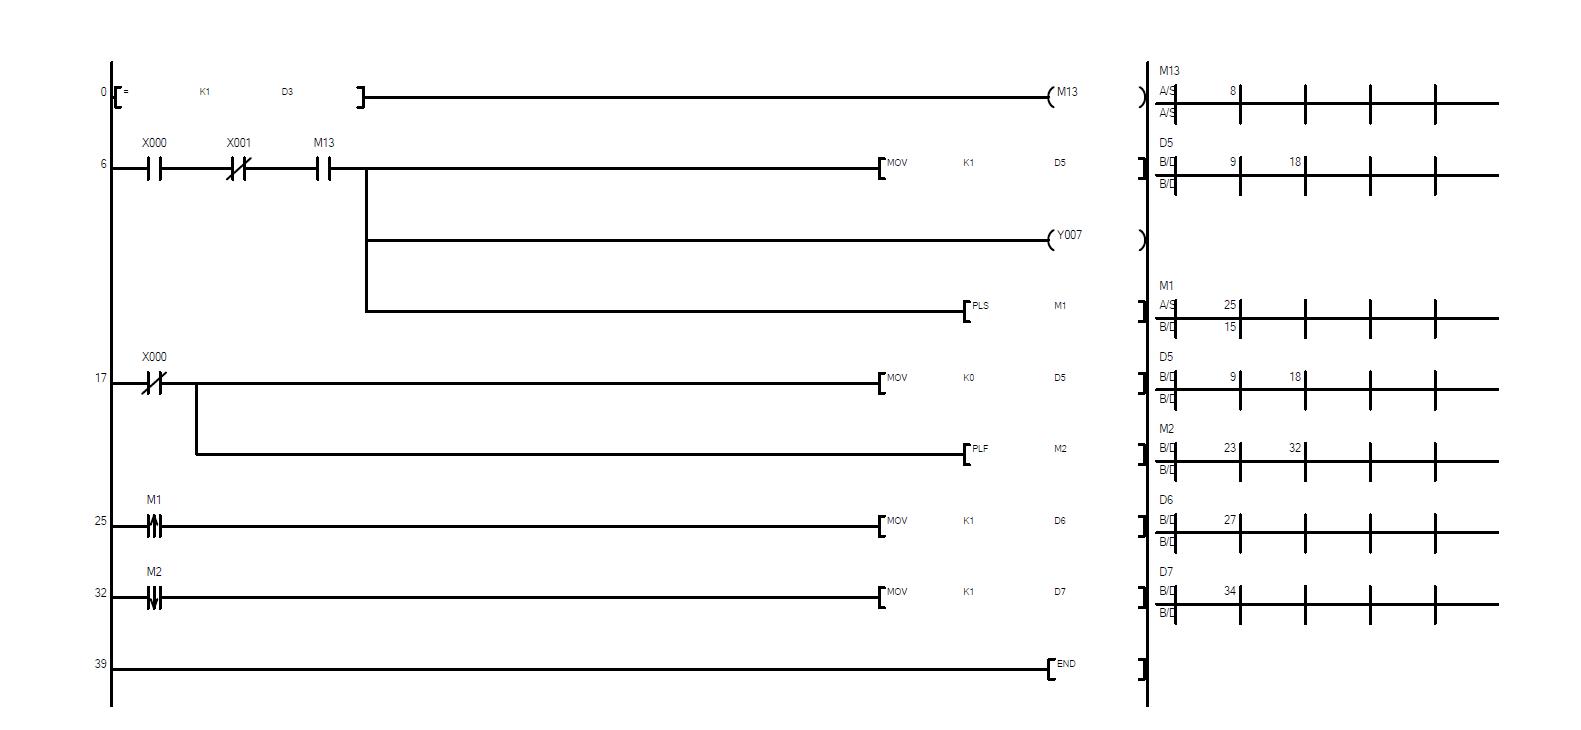 How To Reset The Bits In D6 And D7 After M1 And M2 Is